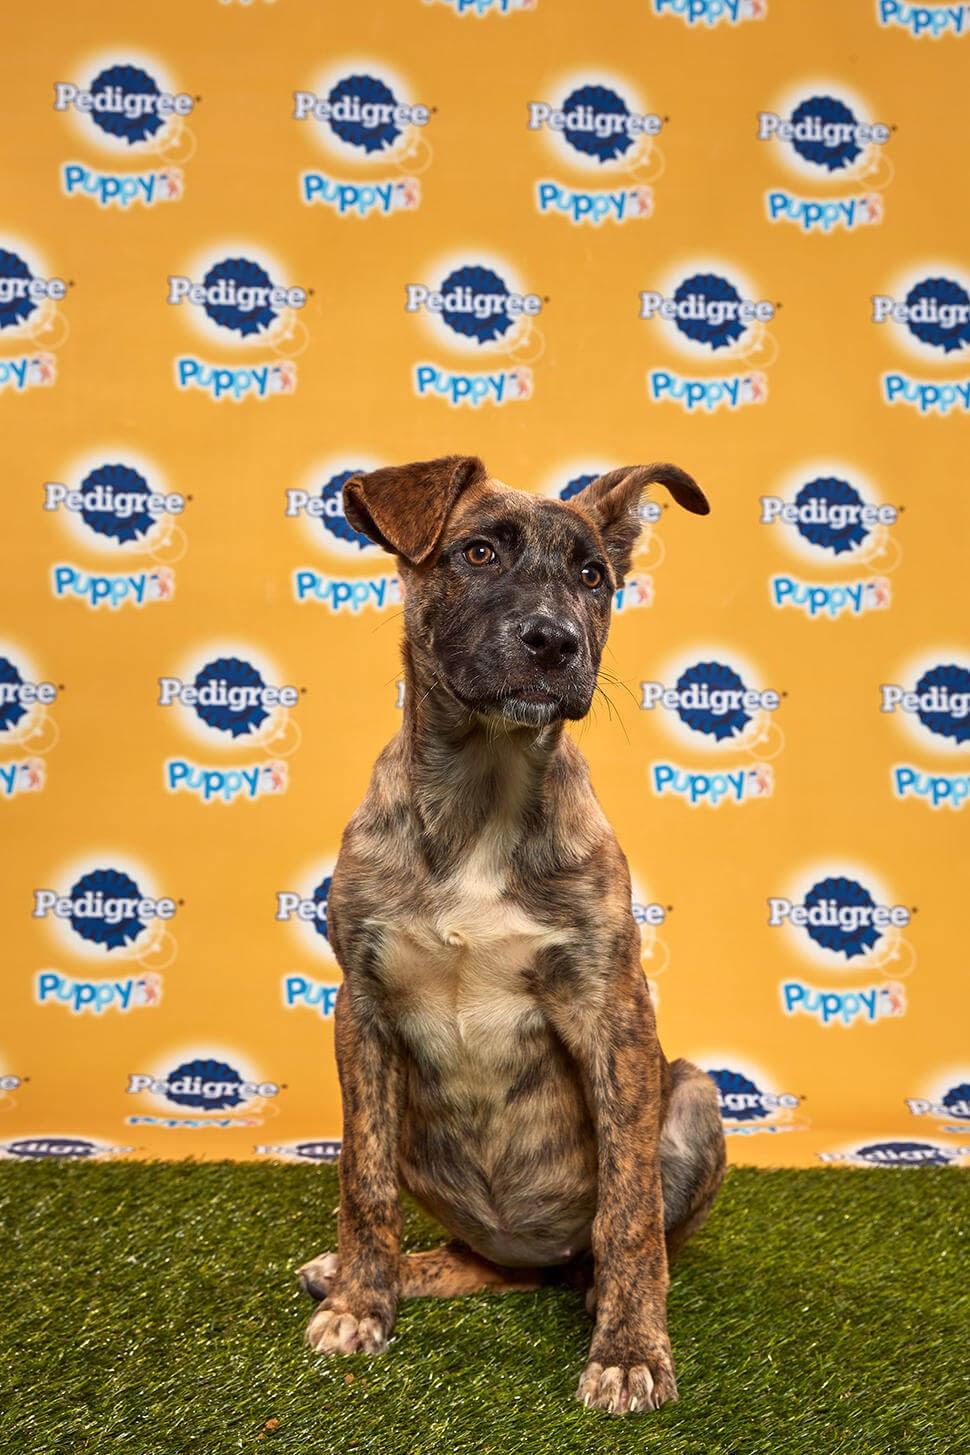 Spritz dog - animal planet